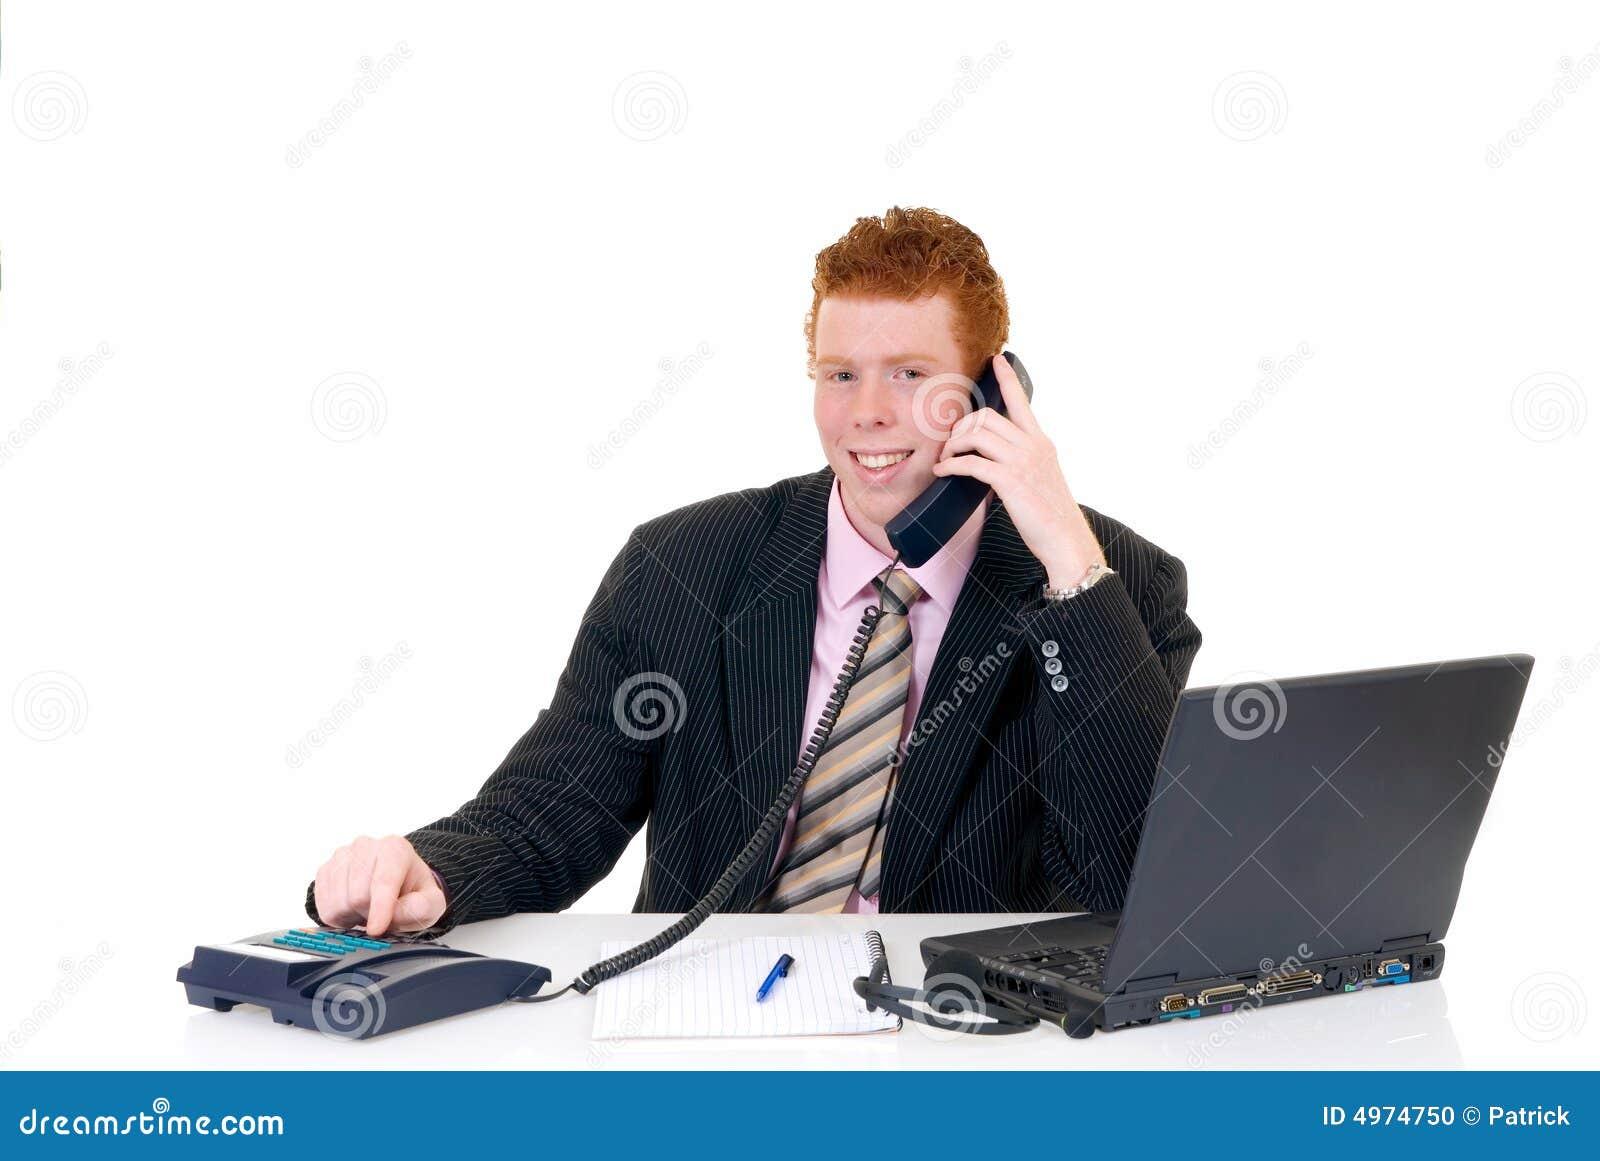 secretary typing wearing headset stock photo image of pretty